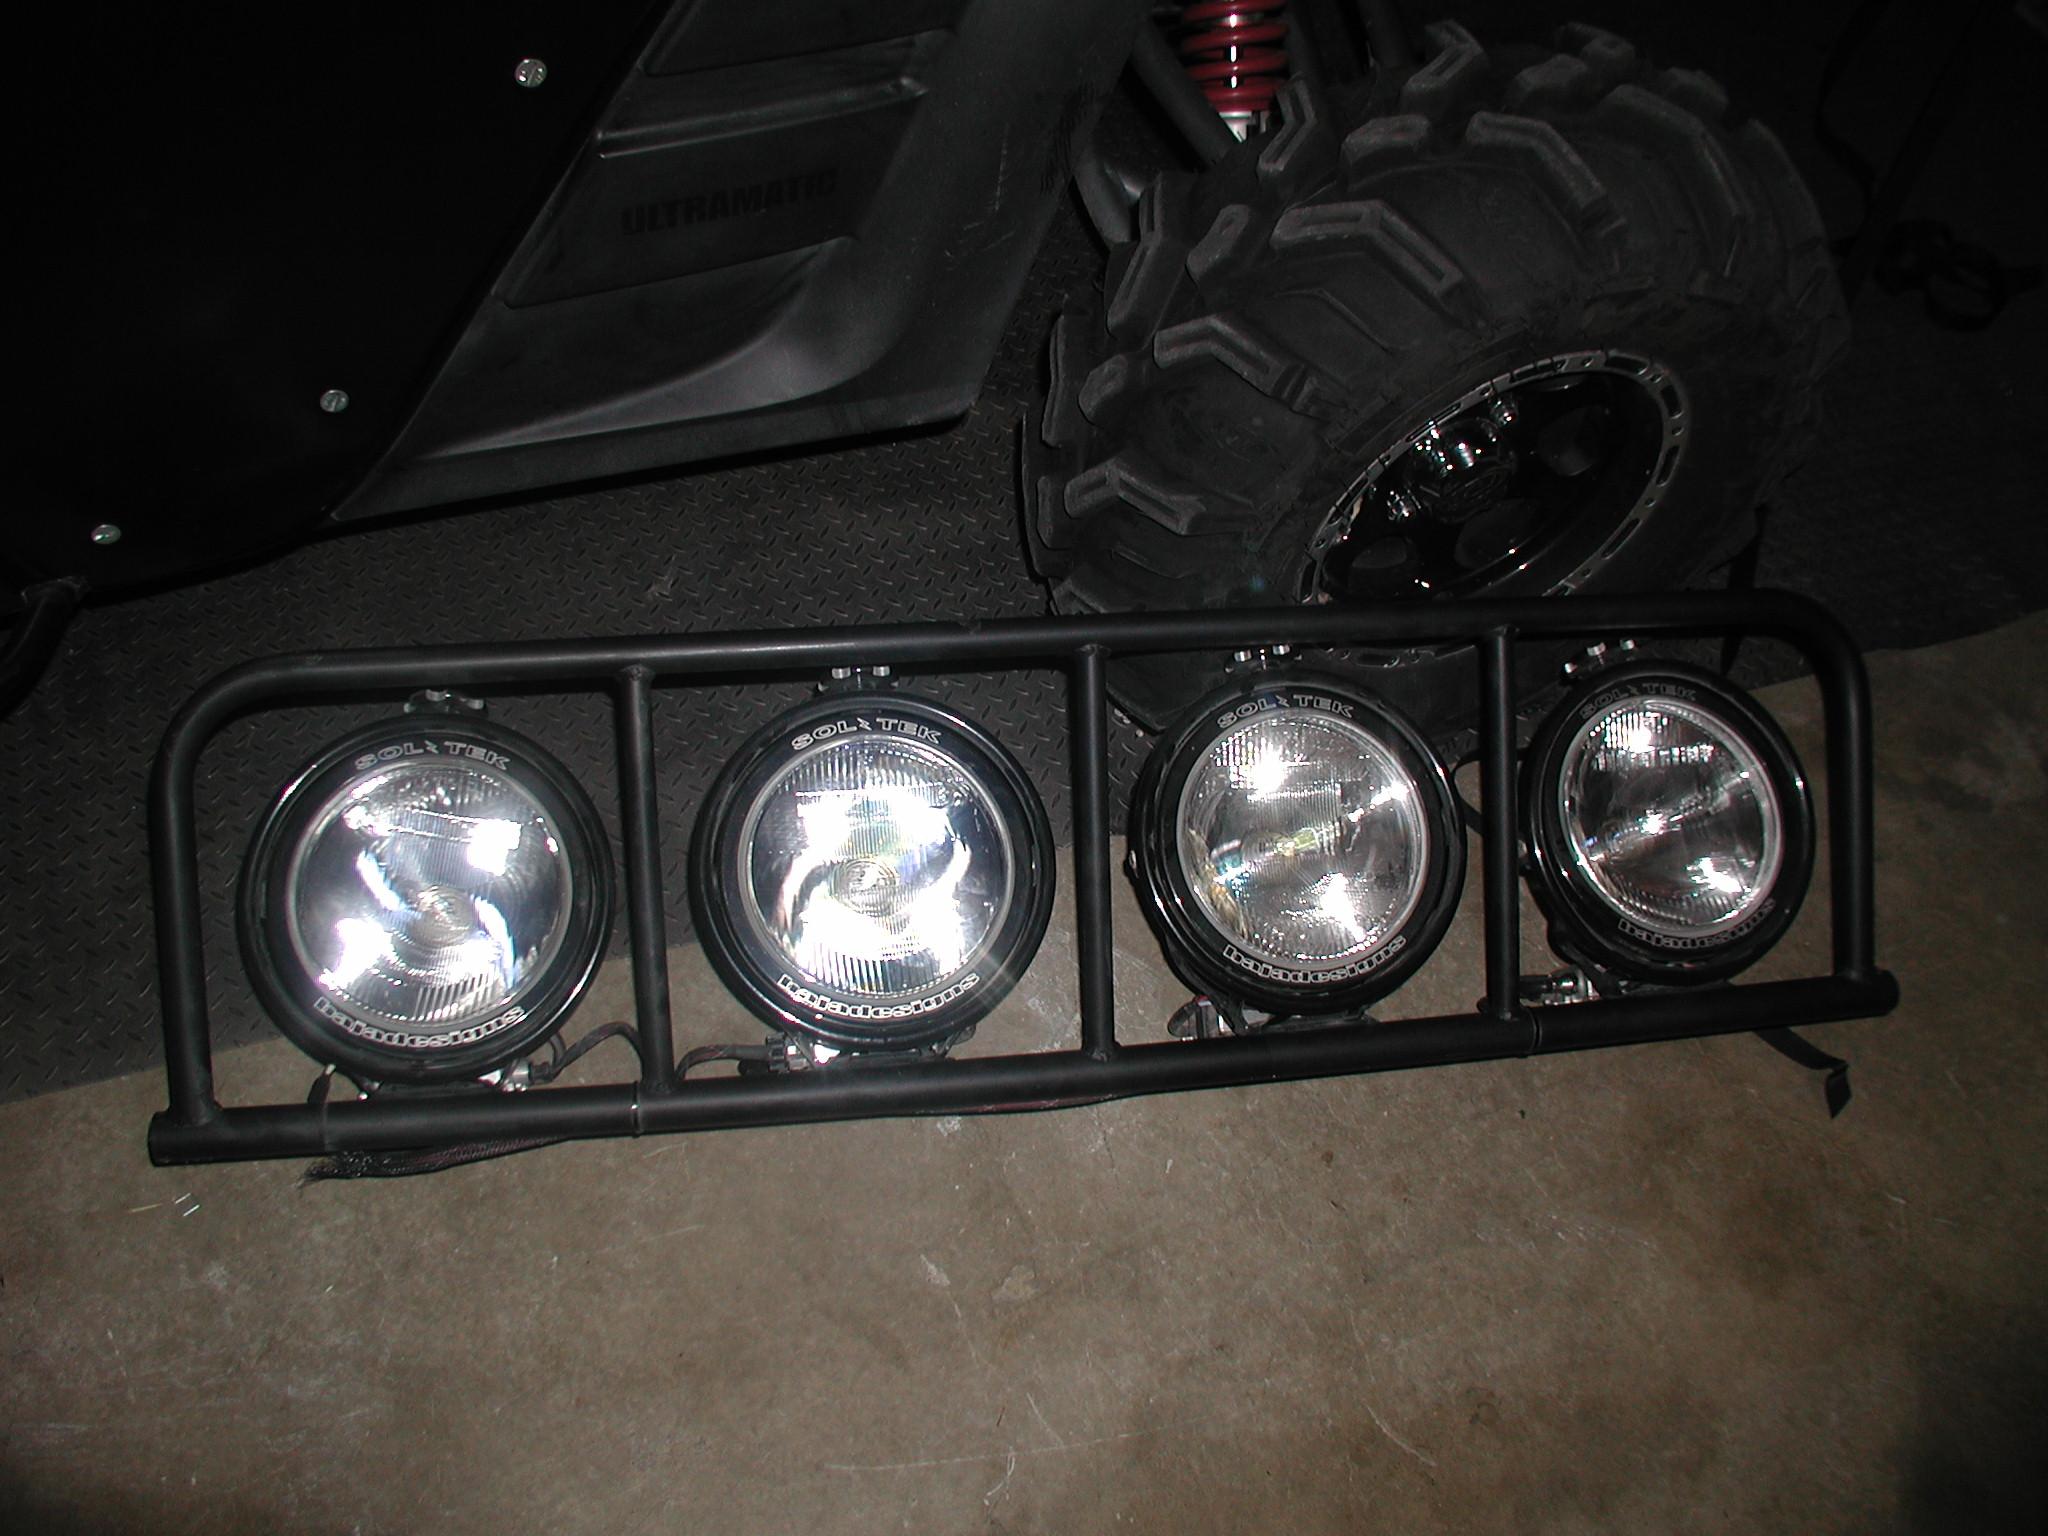 8 Quot Baja Design Hid Lights With Light Bar Yamaha Rhino